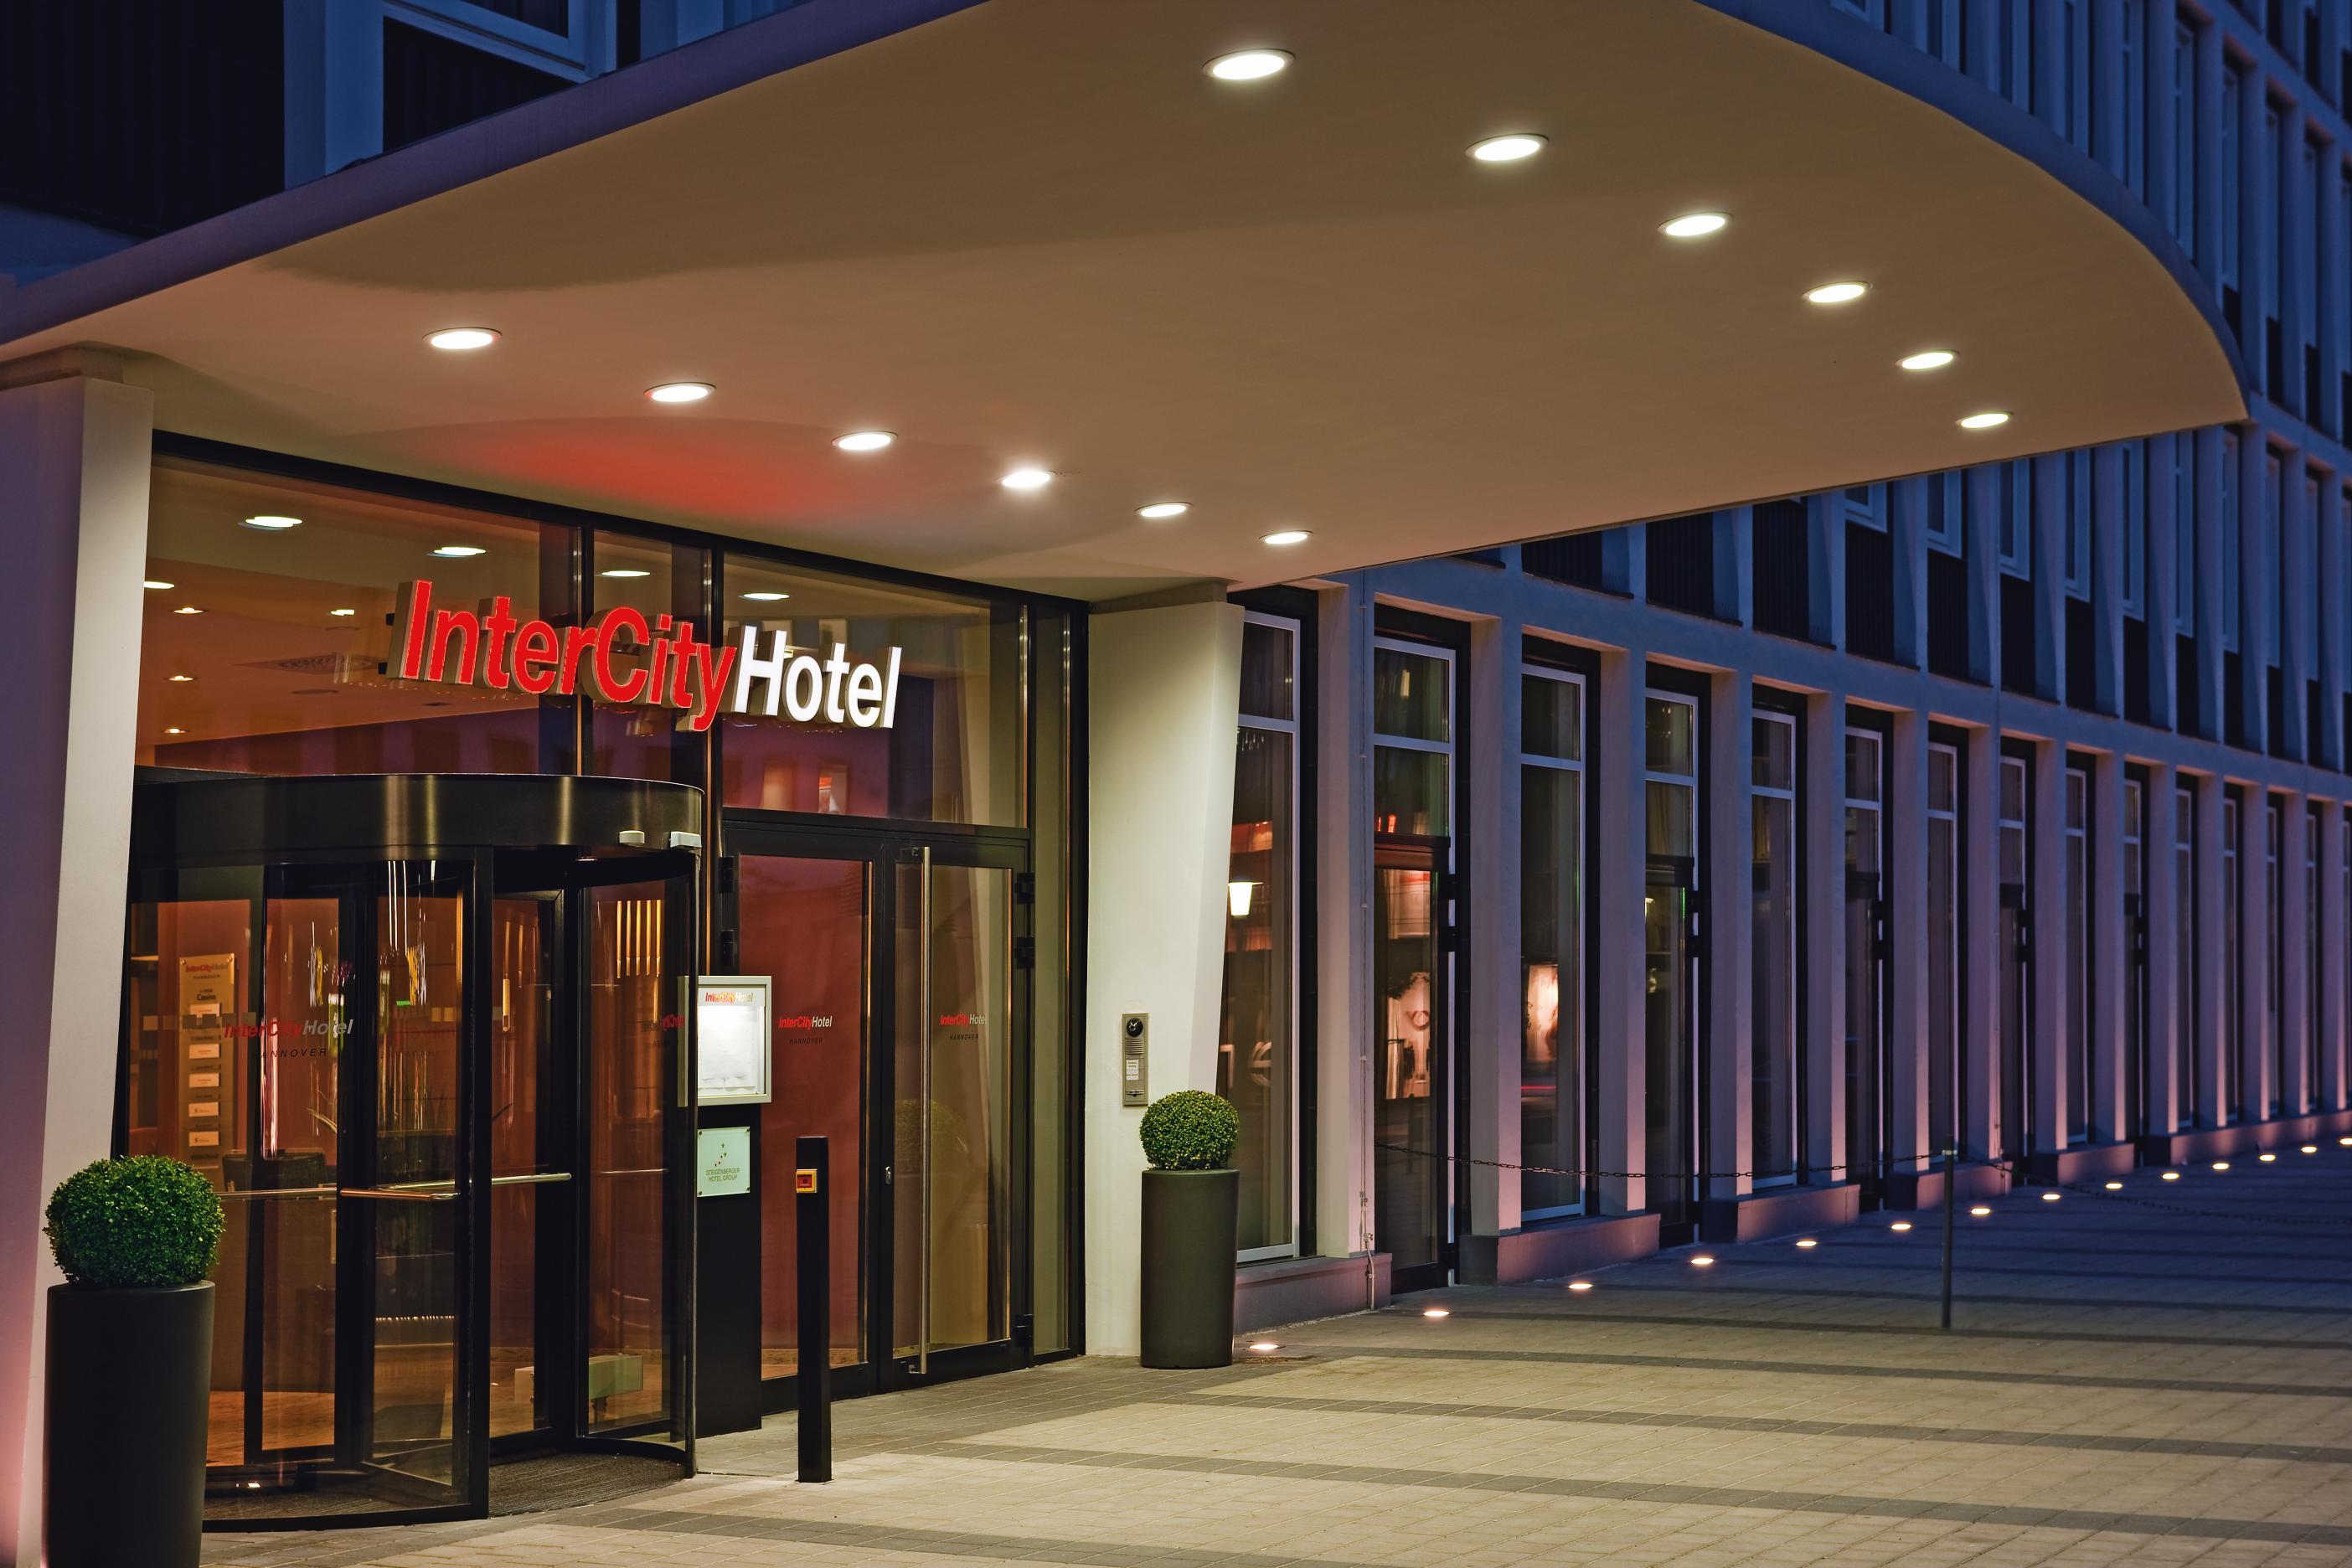 Intercityhotel hannover hotel 4 sterne branchenbuch for 4 sterne hotel dortmund